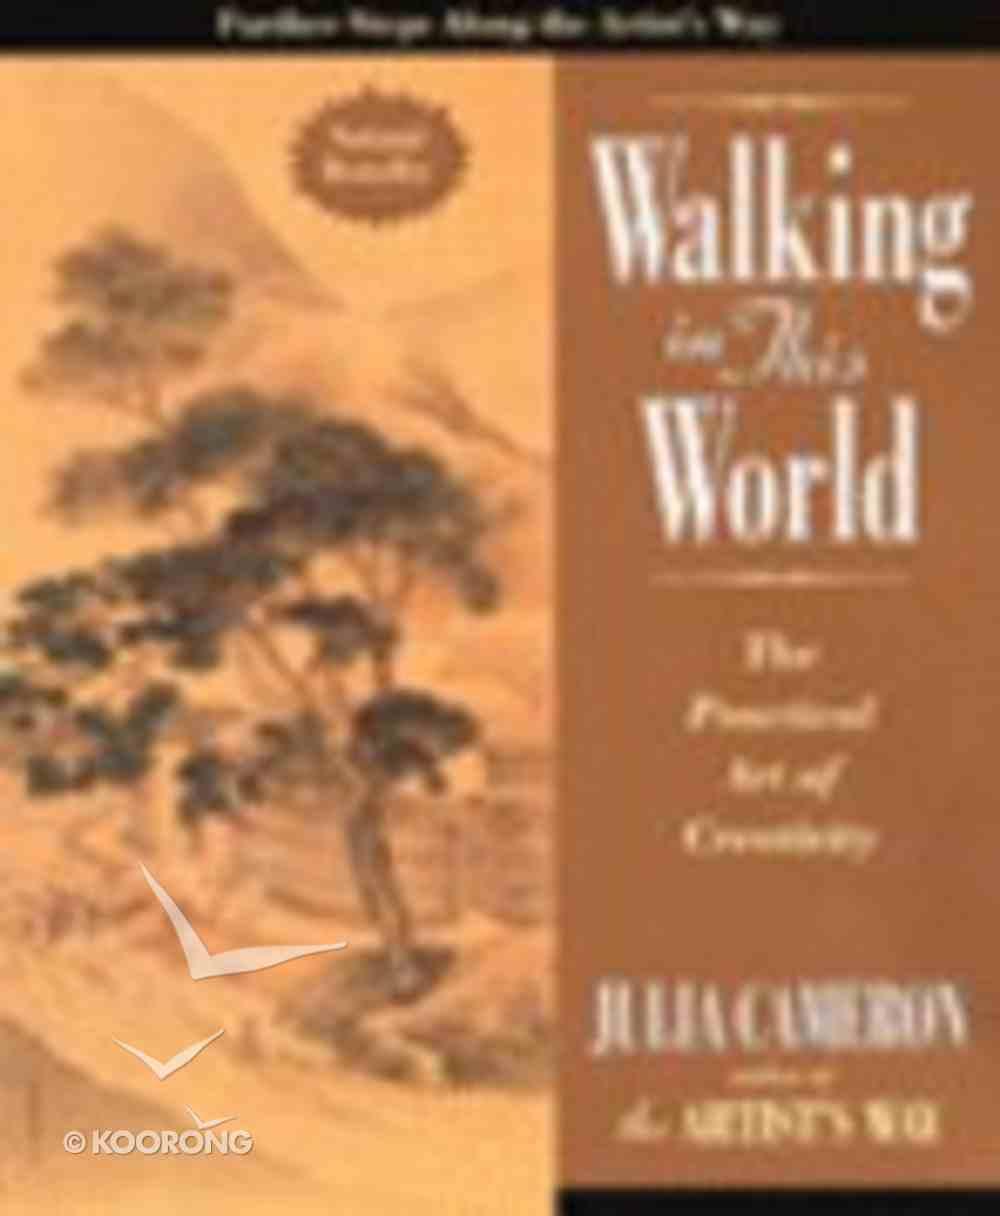 Walking in This World Paperback